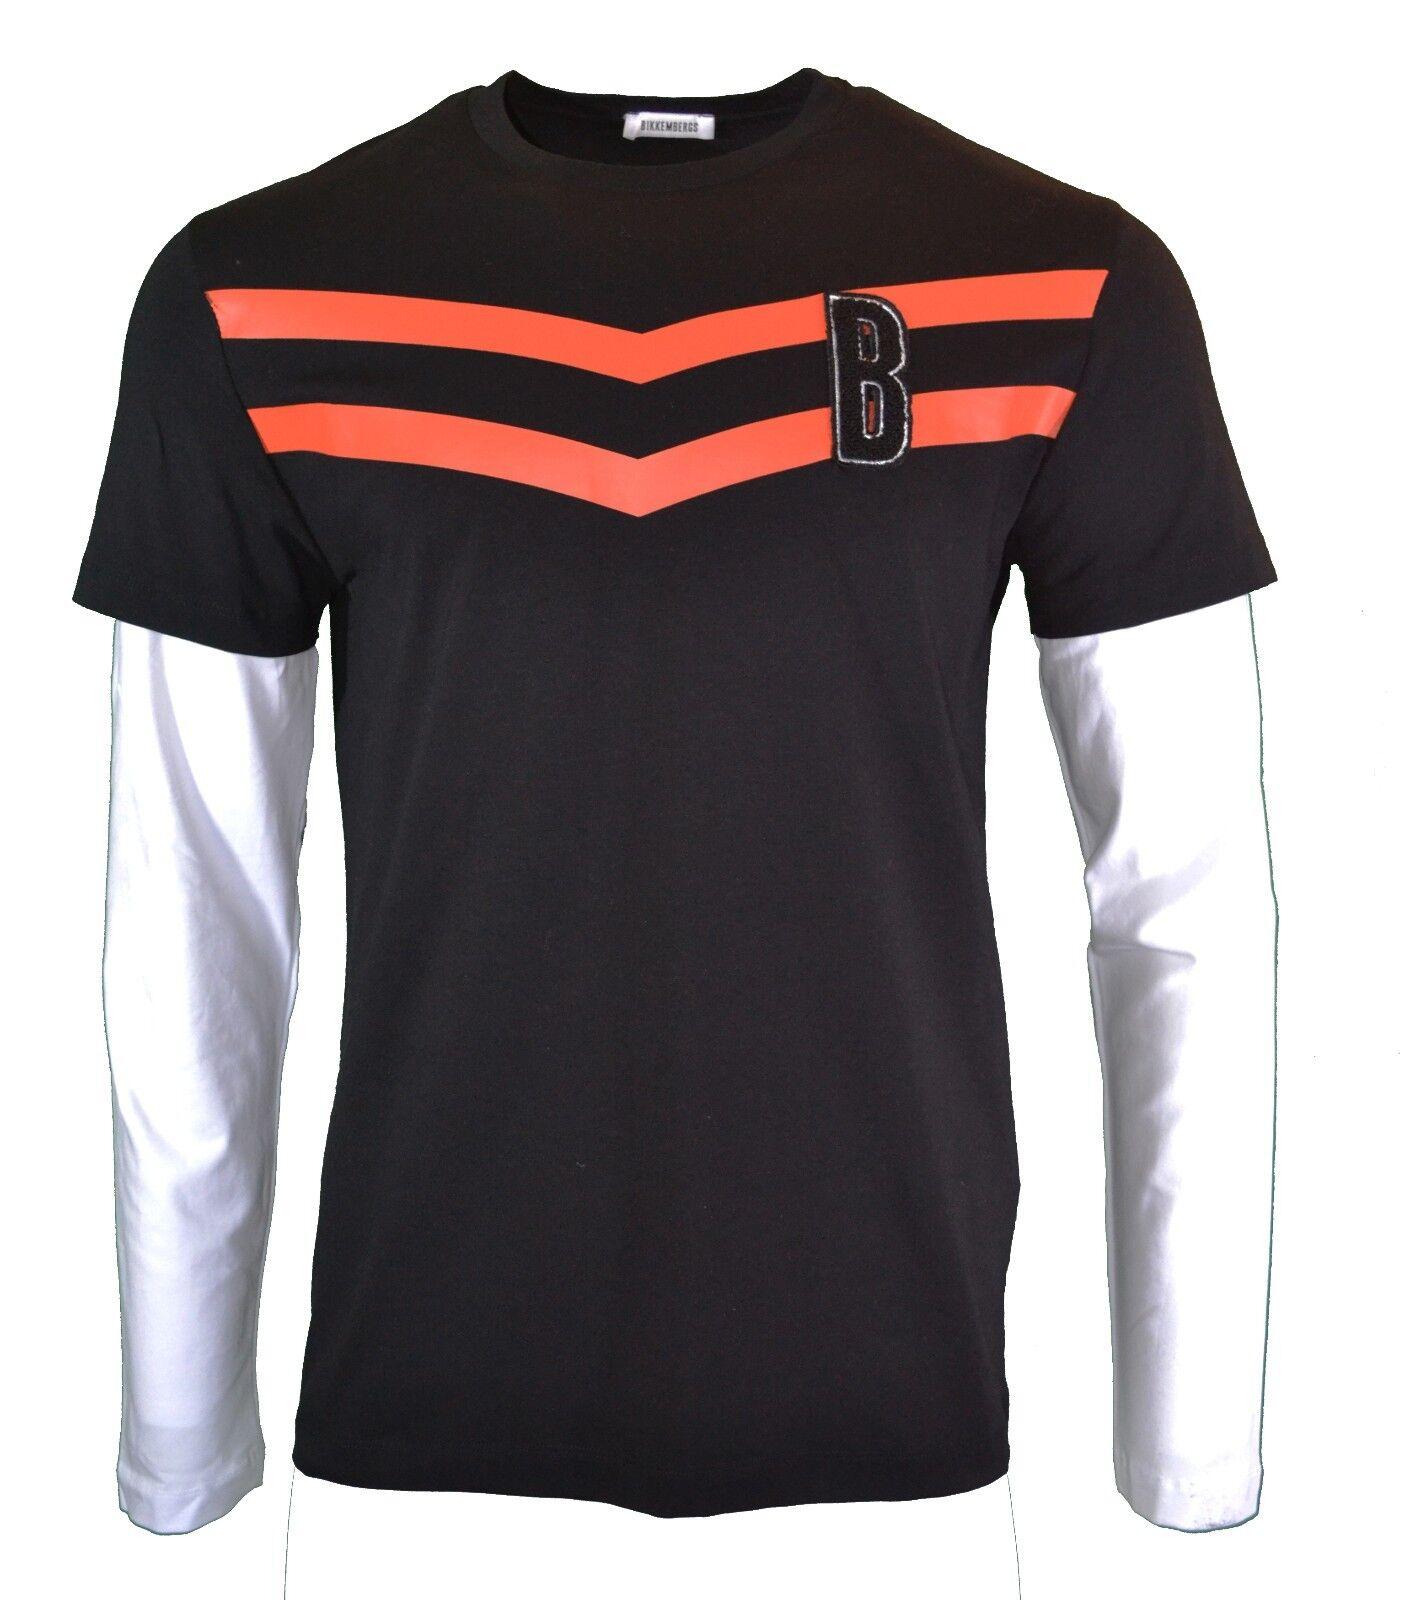 50% OFF   BIKKEMBERGS doppio strato a manica lunga T-Shirt Top Nero Arancione RARO